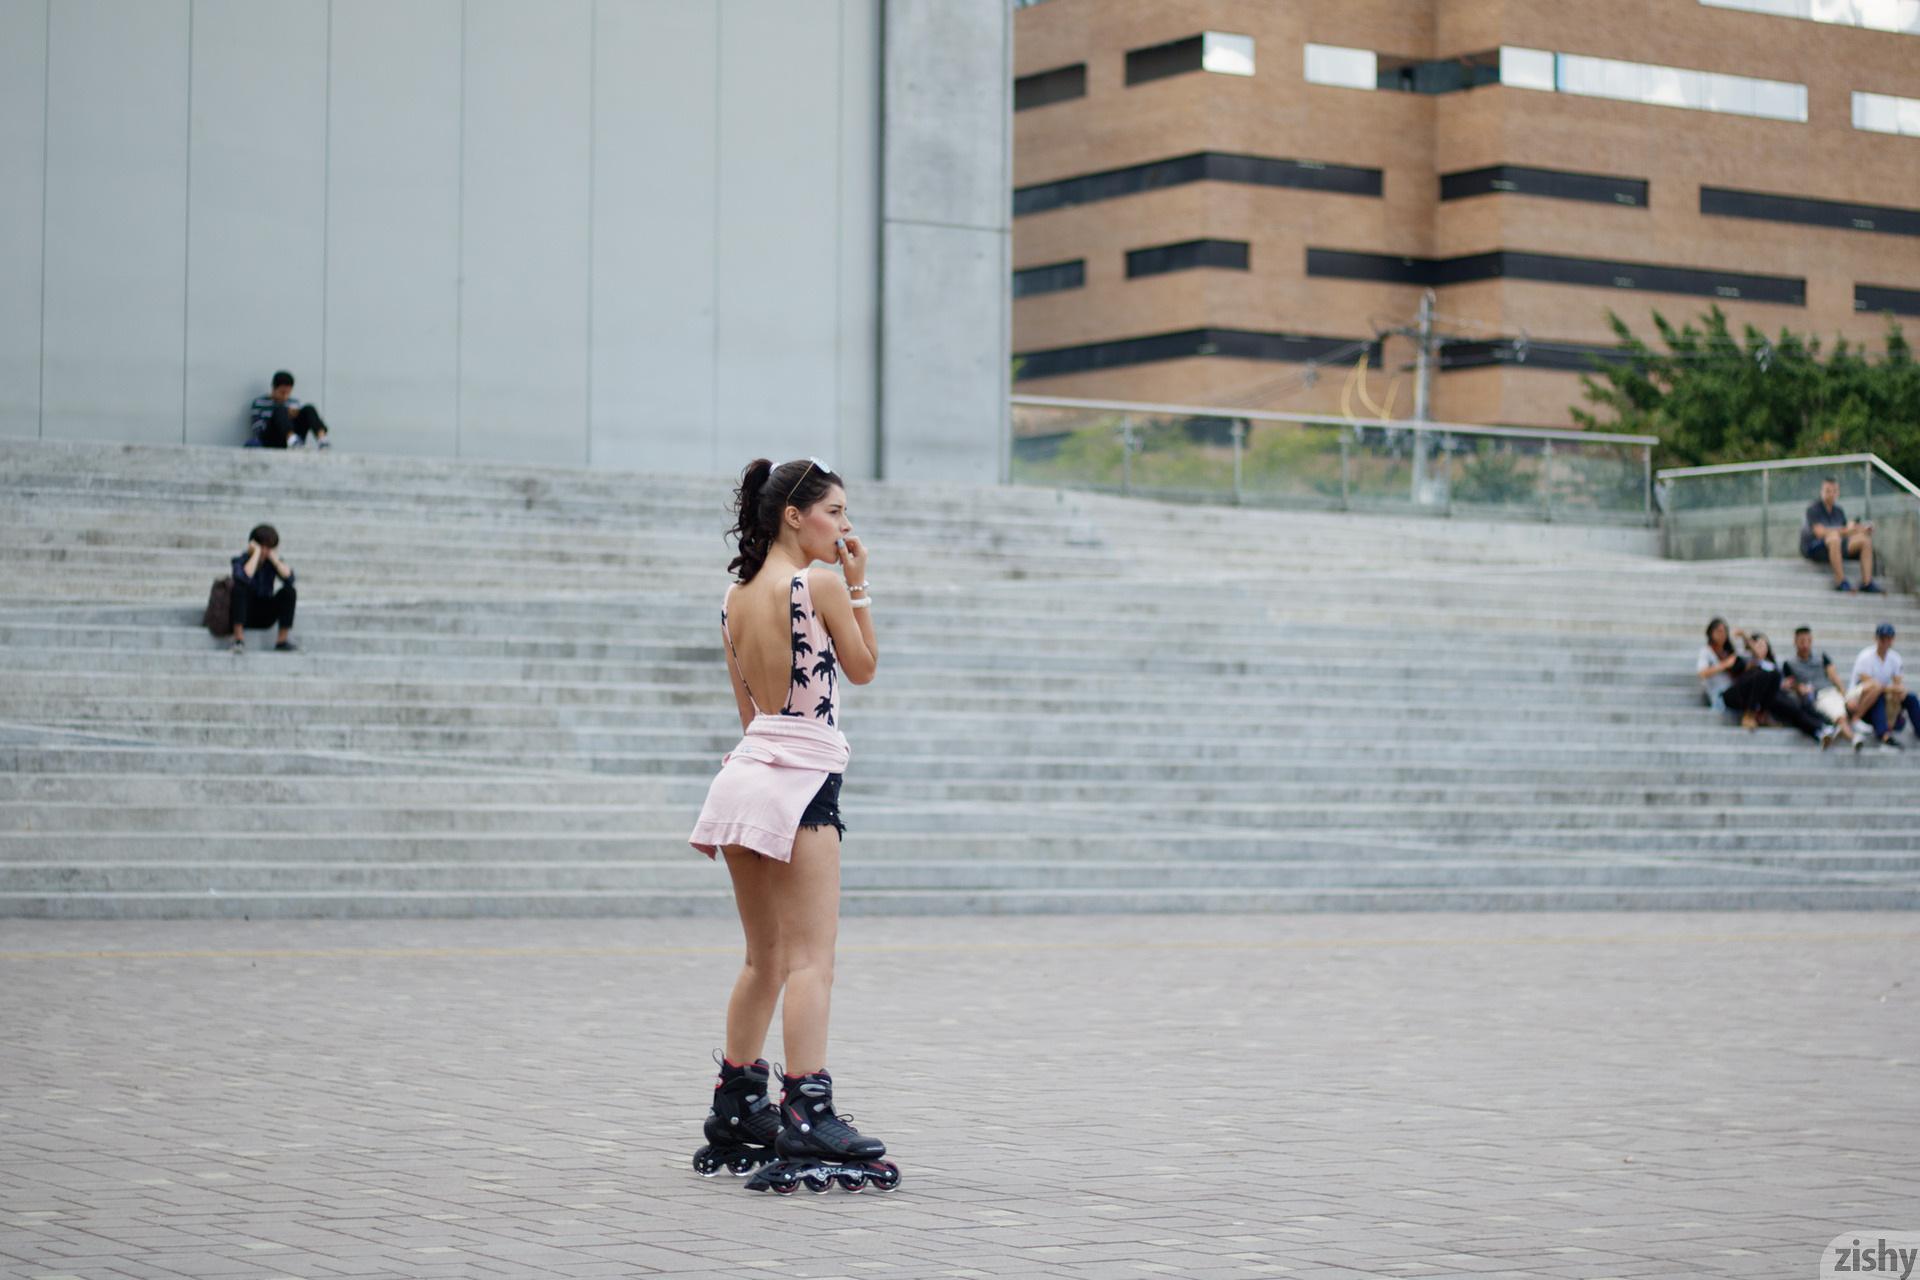 Kate Maze Skates Colombia Zishy (10)